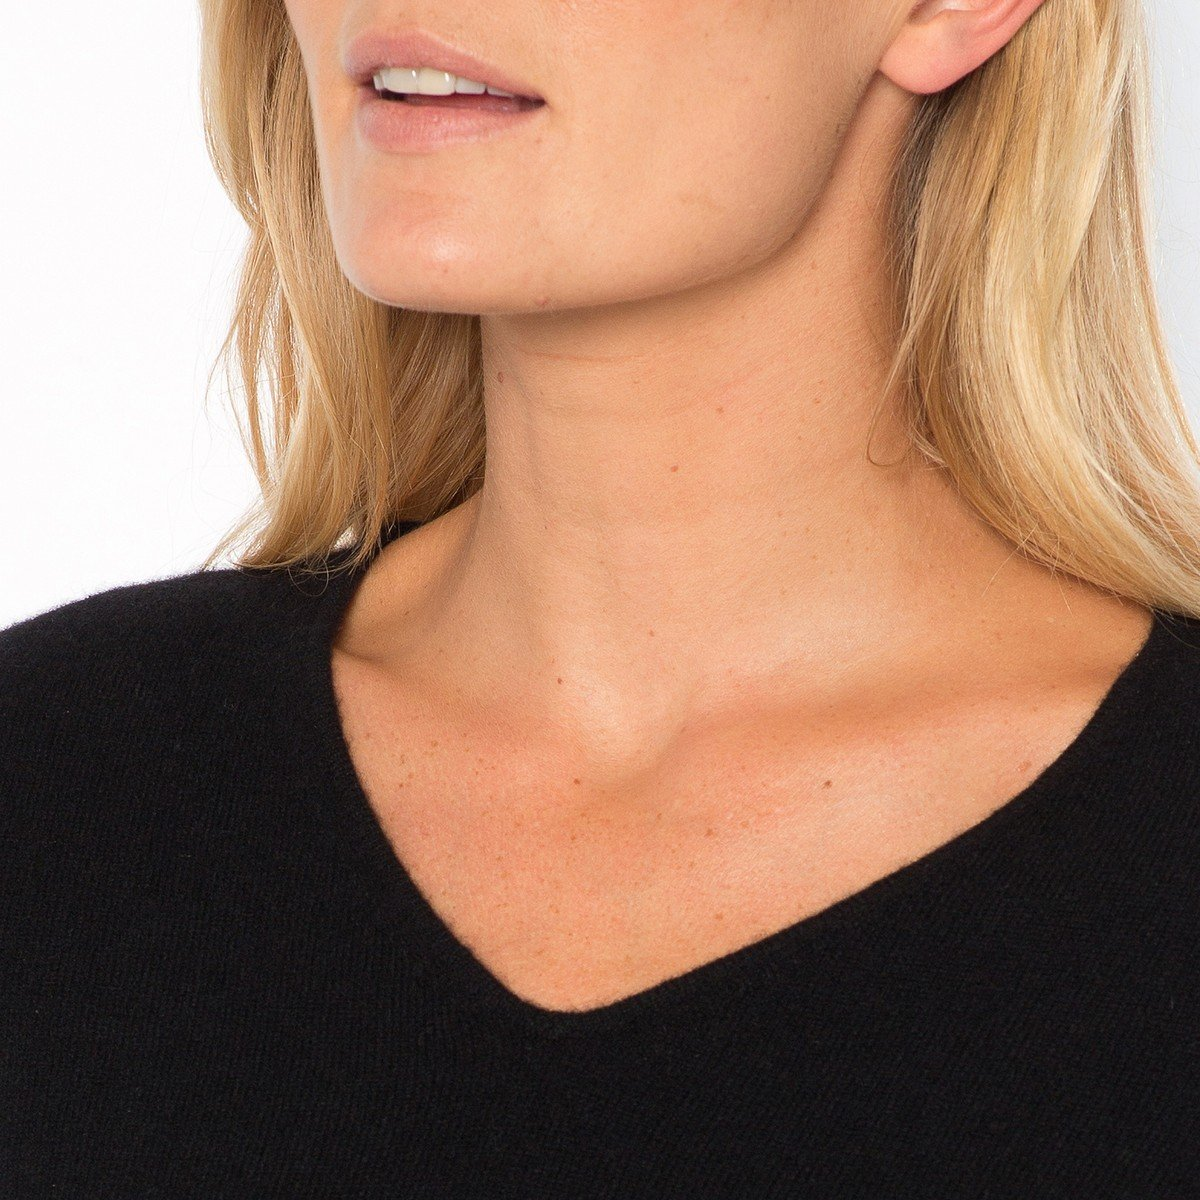 La Redoute Womens Fine Knit Cashmere V-Neck Jumper/Sweater Black Size Us 16/18 - Fr 46/48 by La Redoute (Image #4)